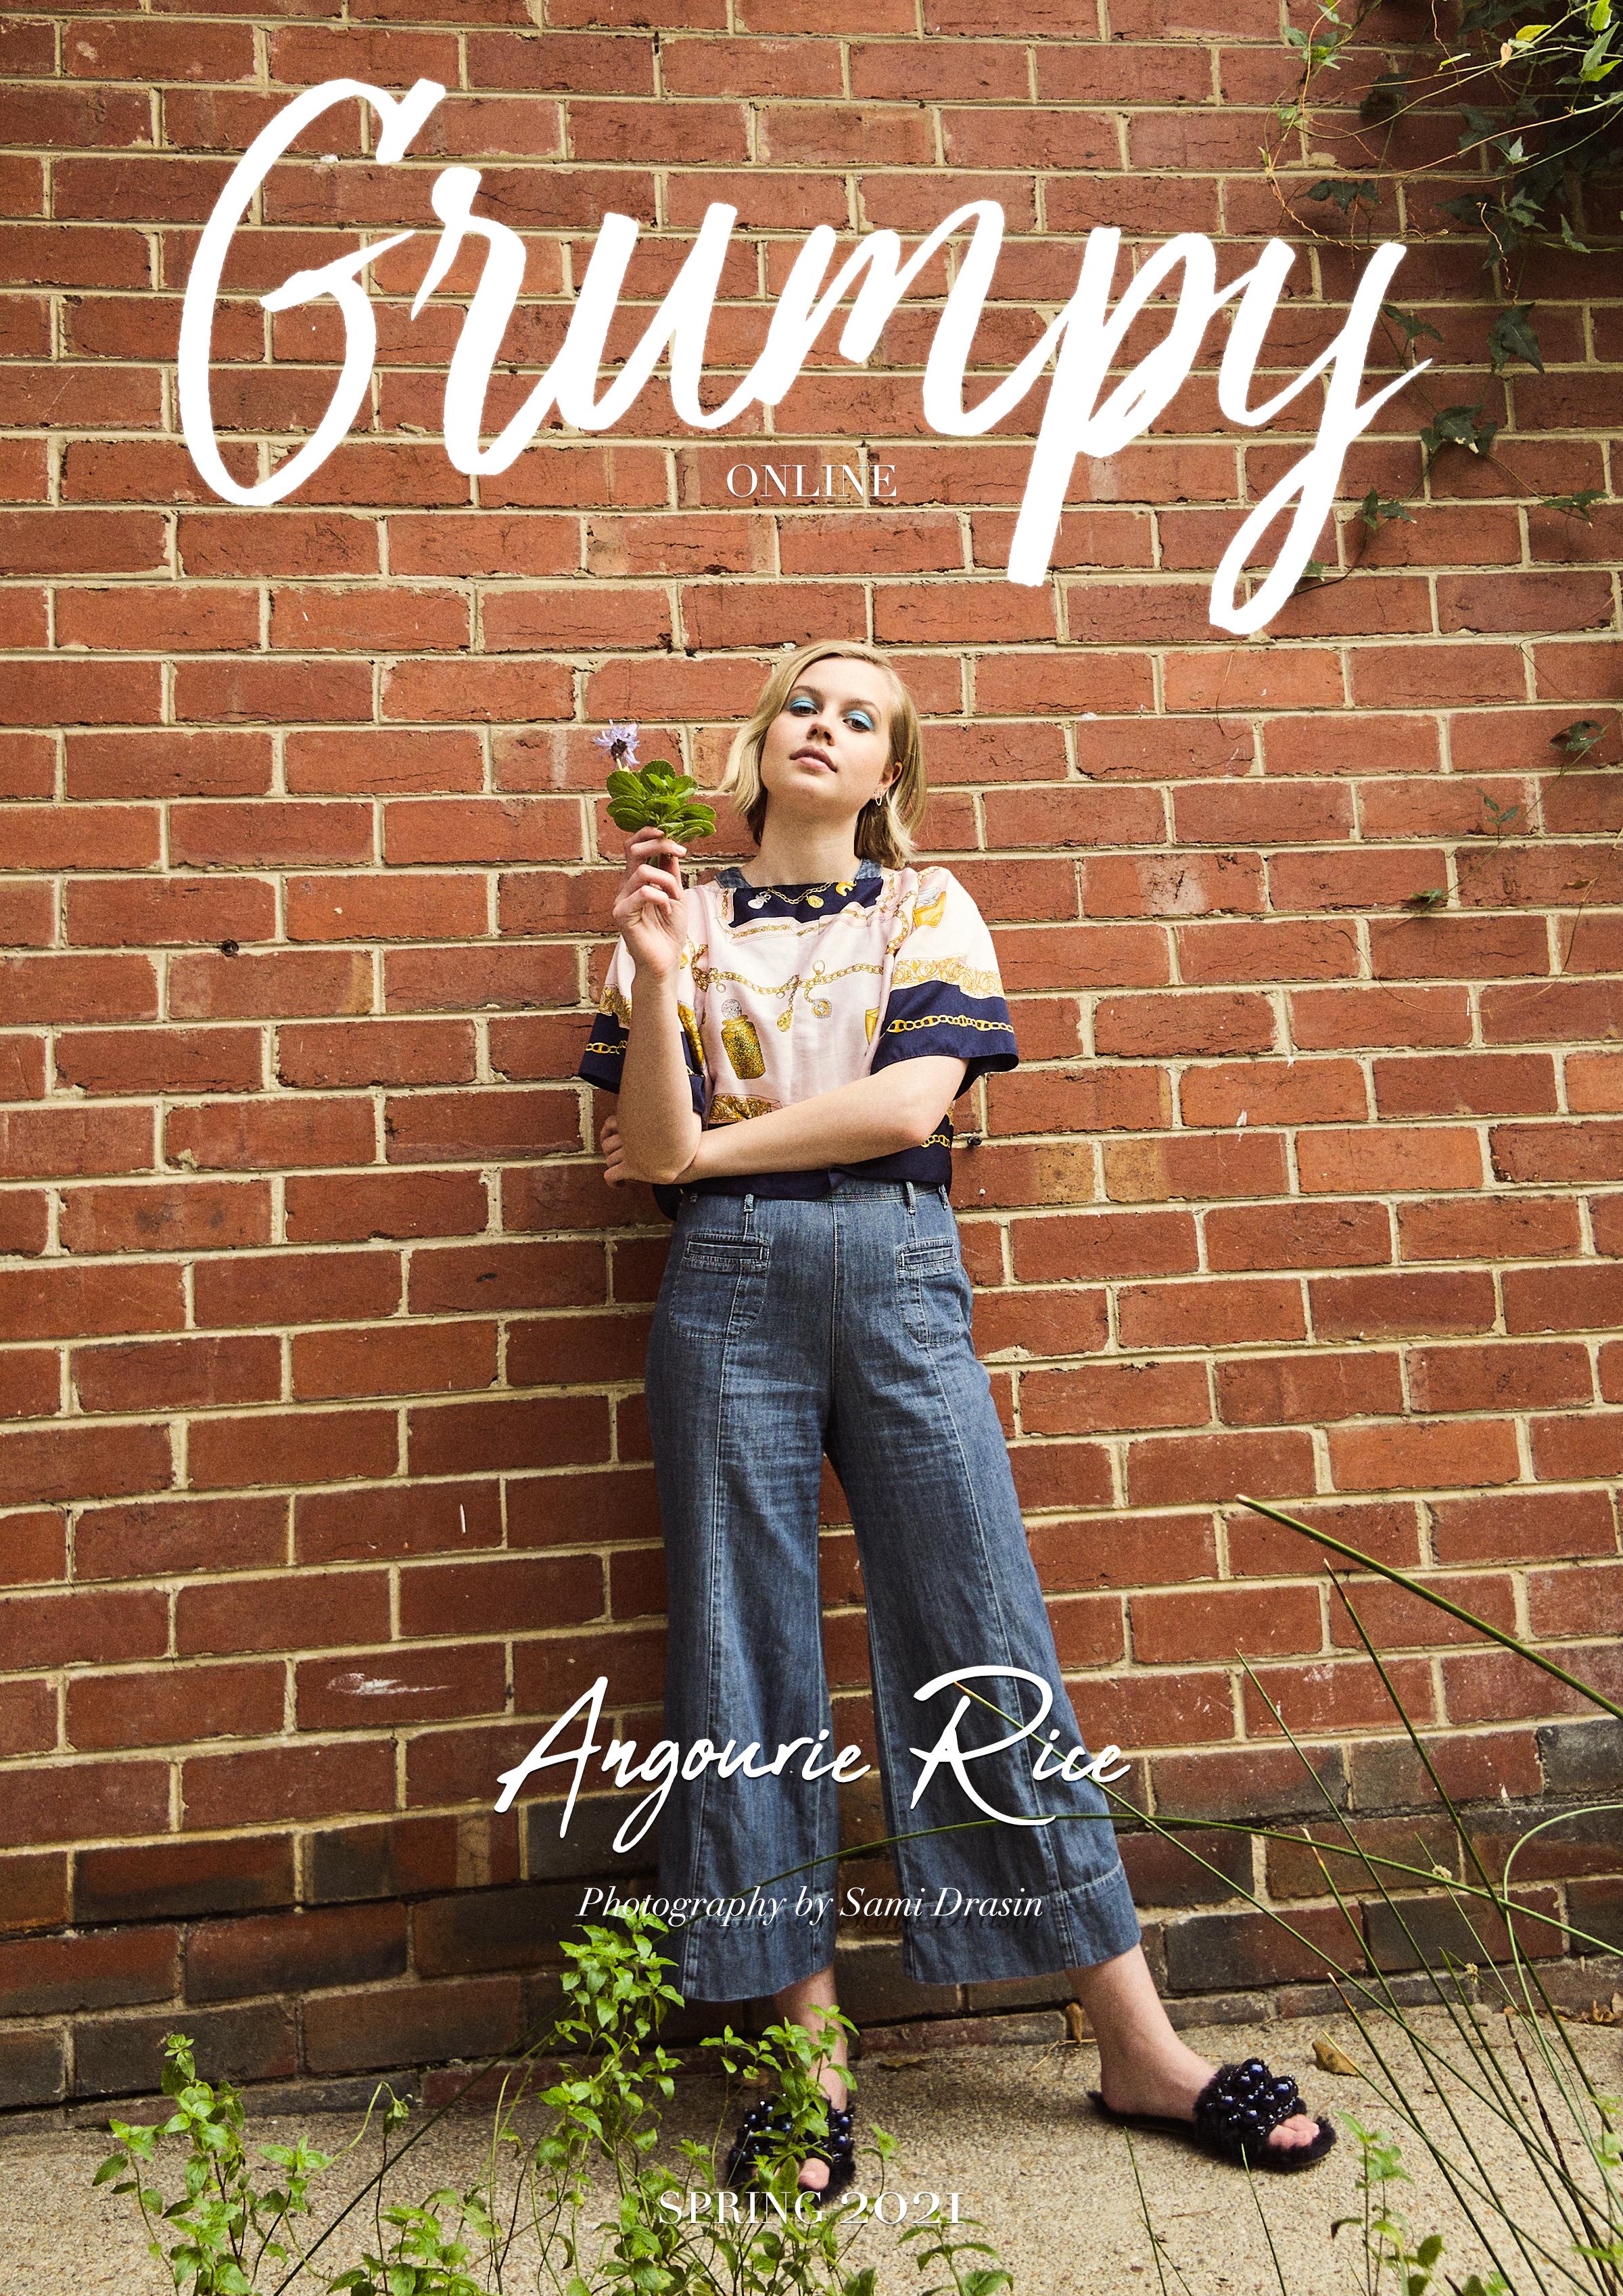 AG-COVER GRUMPY